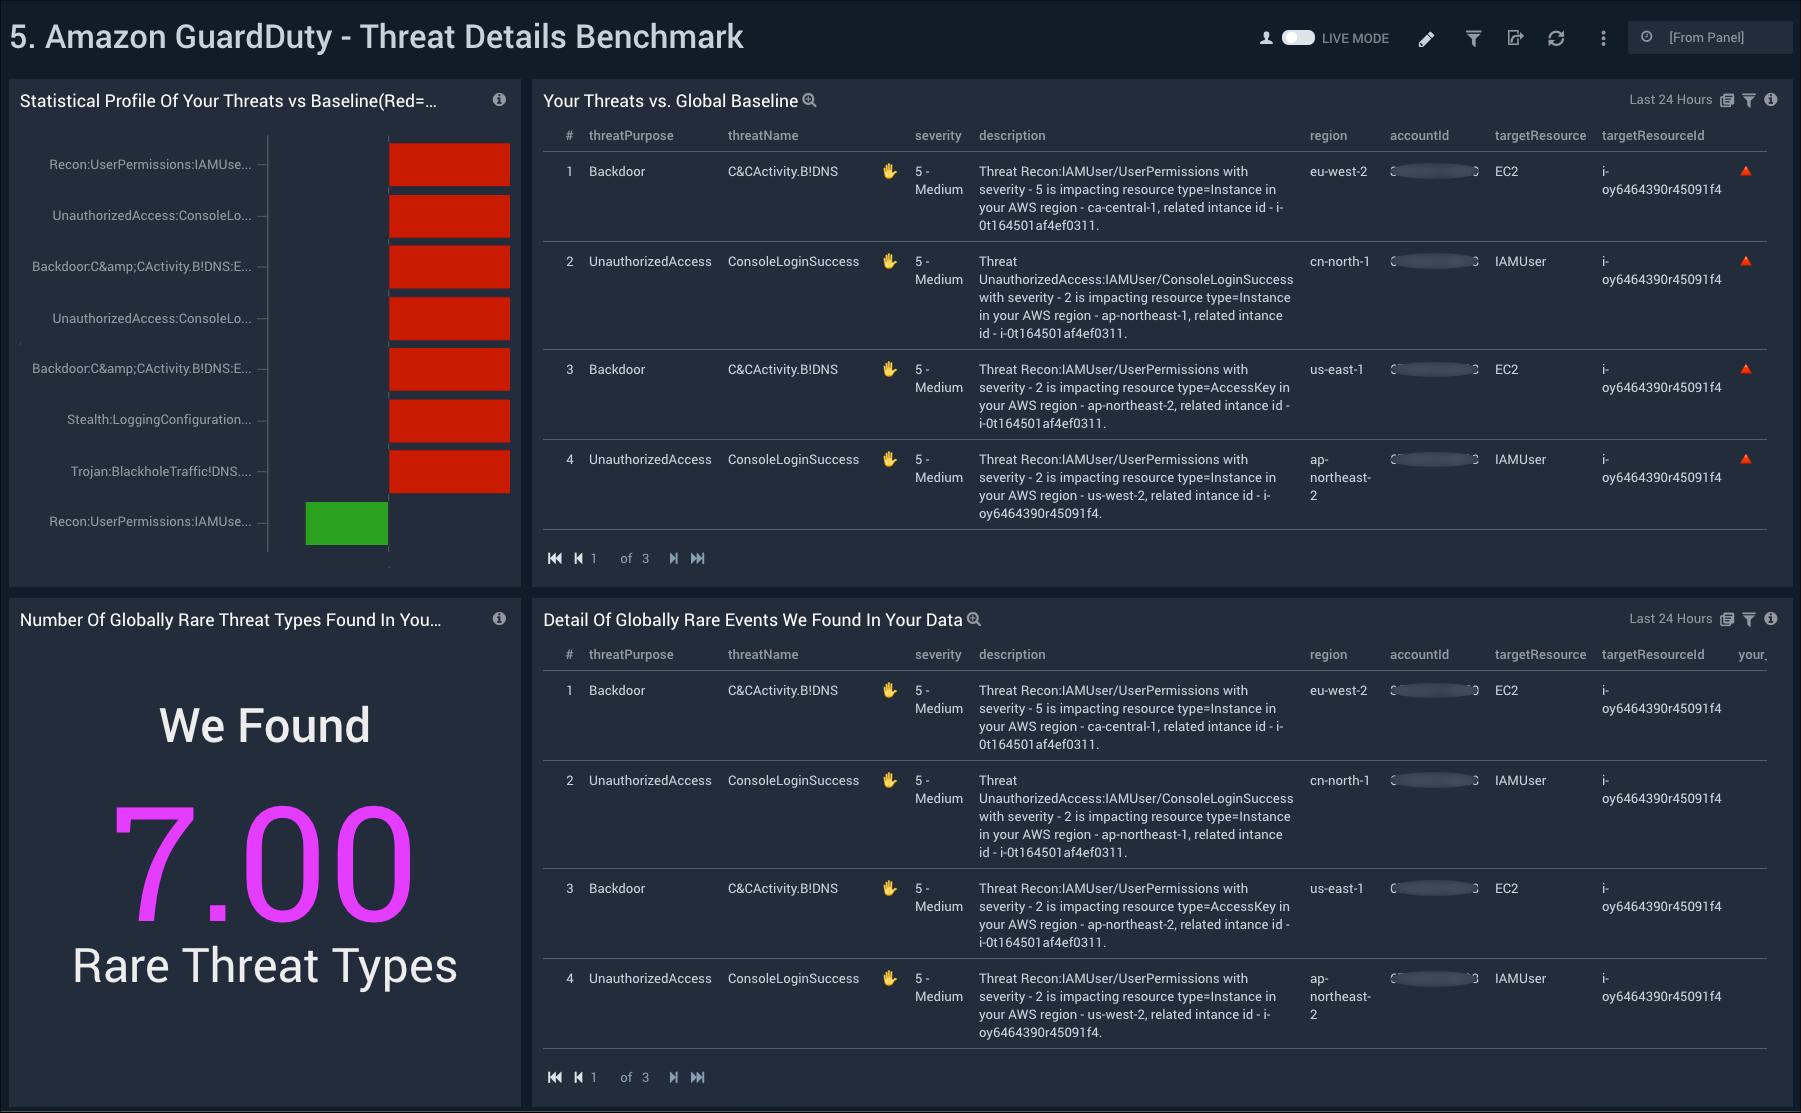 Amazon GuardDuty - Threat Details Benchmark